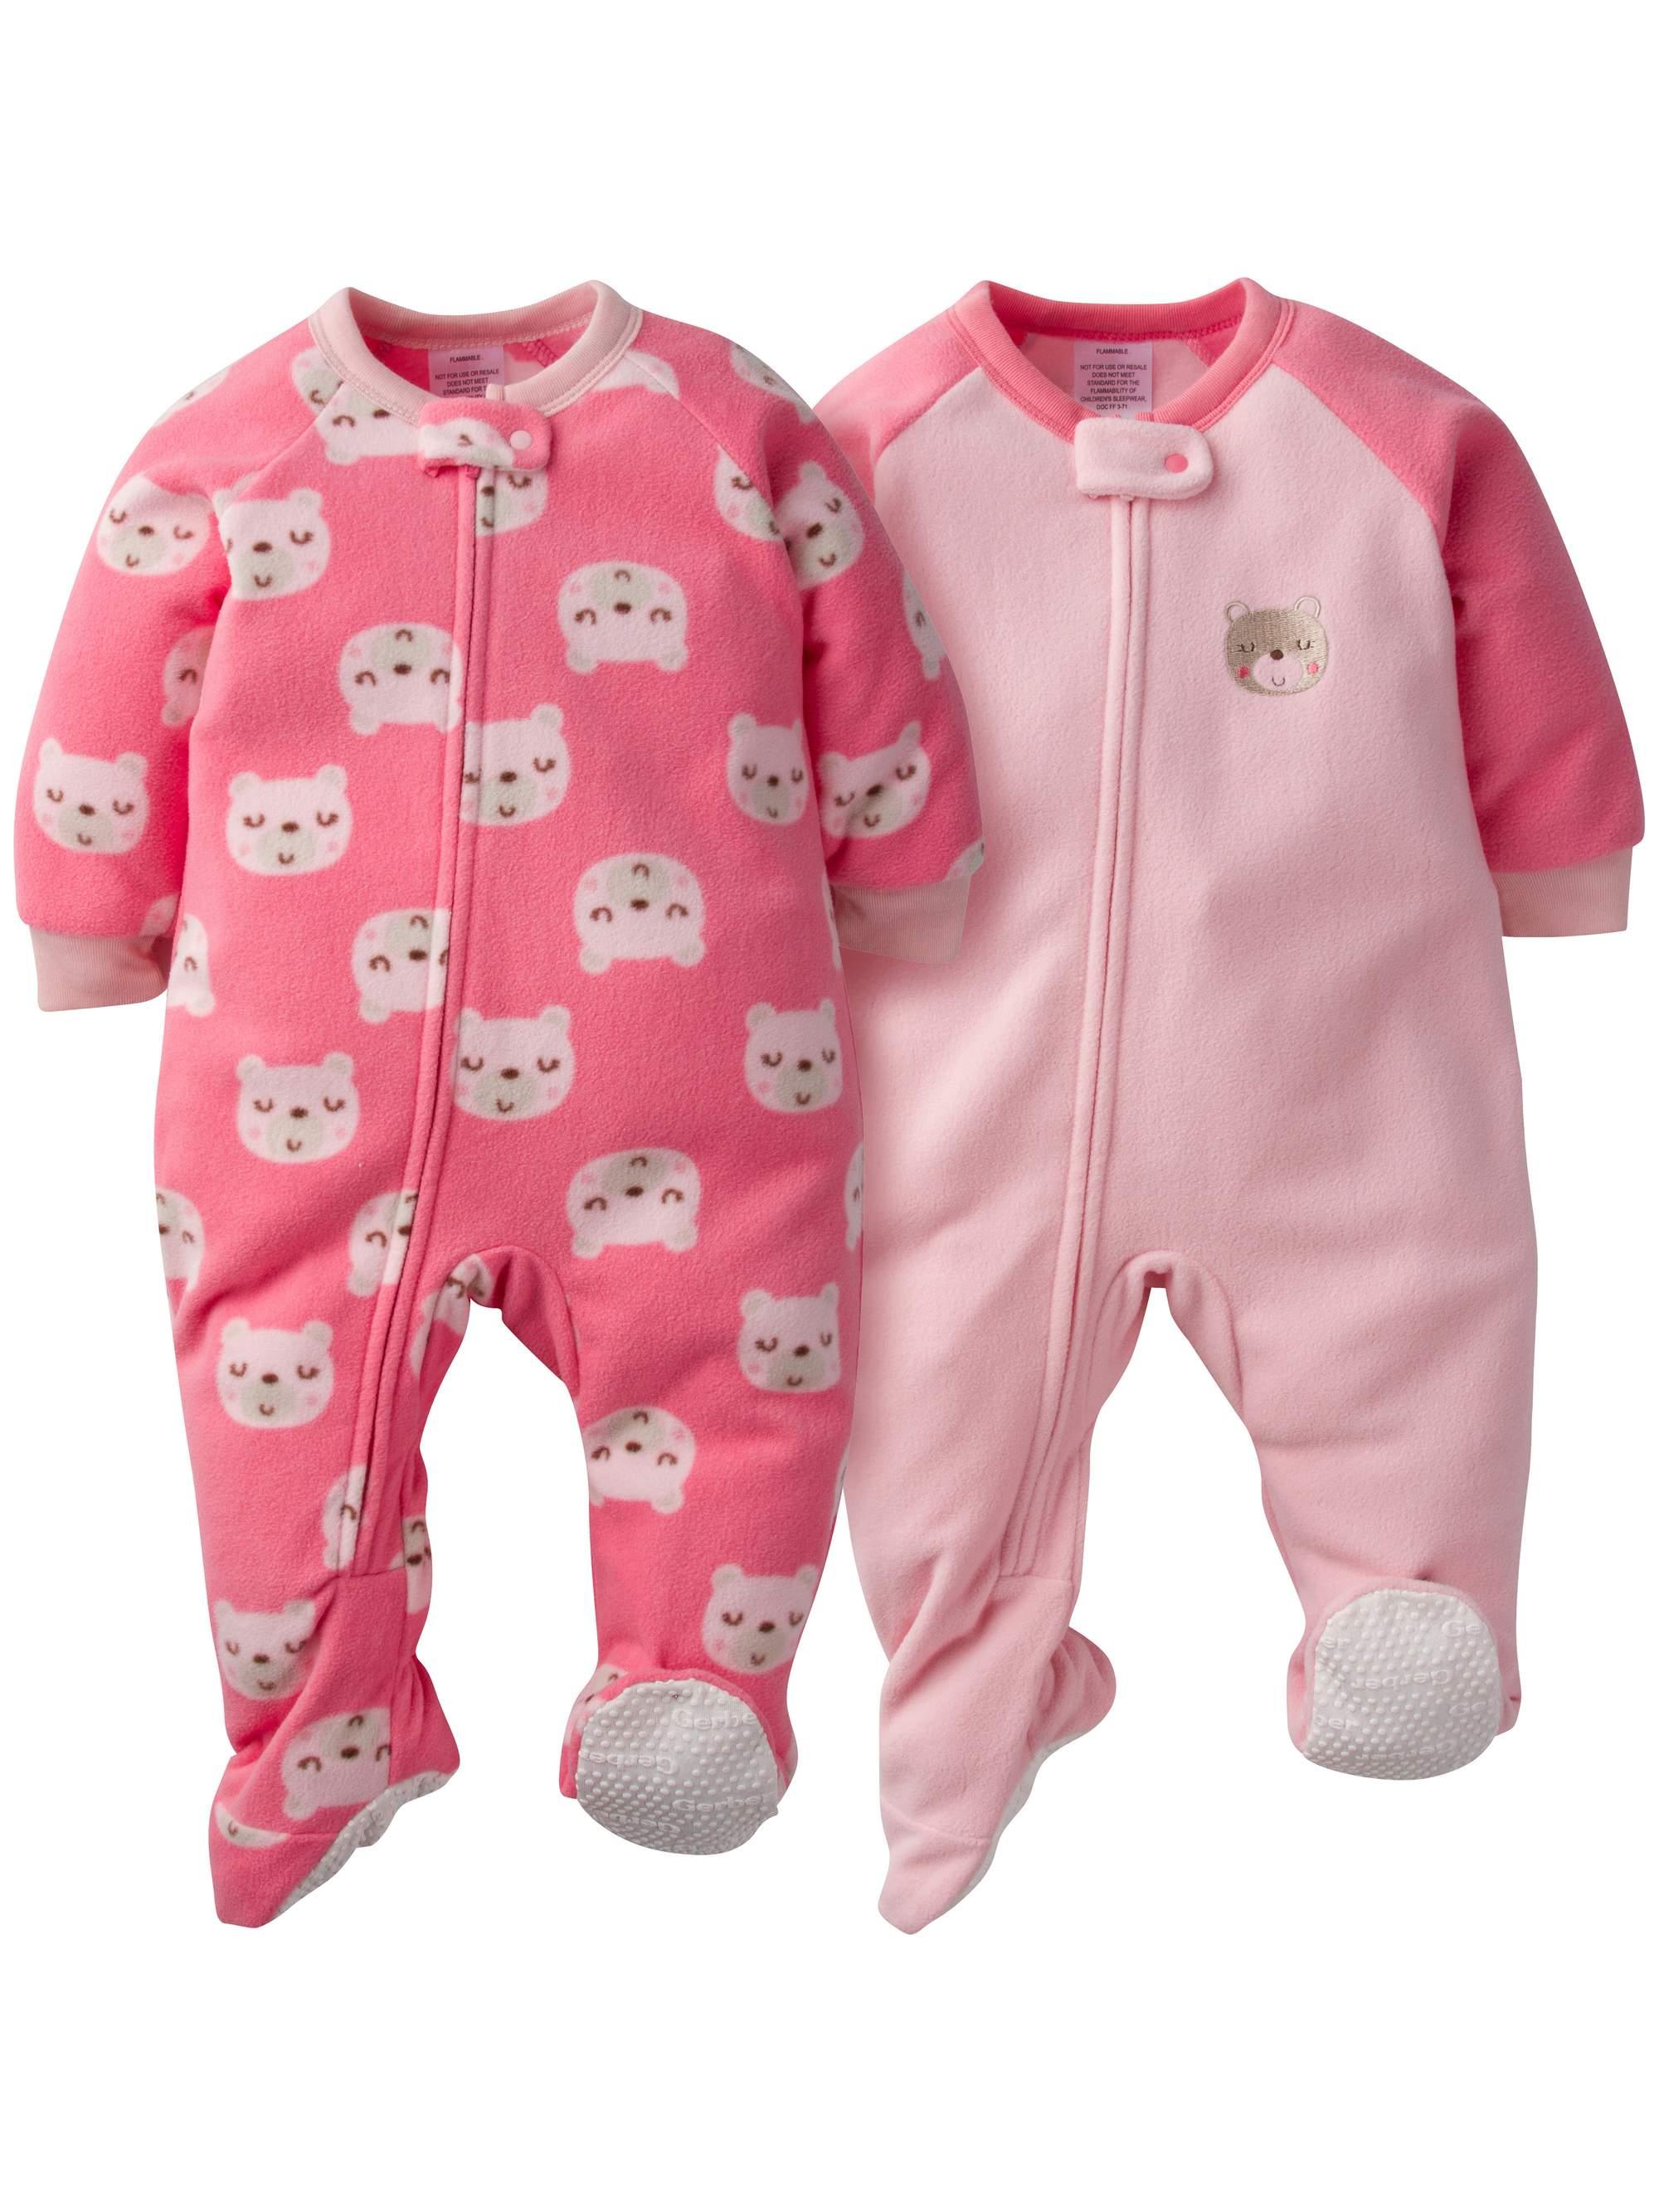 Gerber Microfleece Blanket Sleeper, 2pk (Baby Girls)